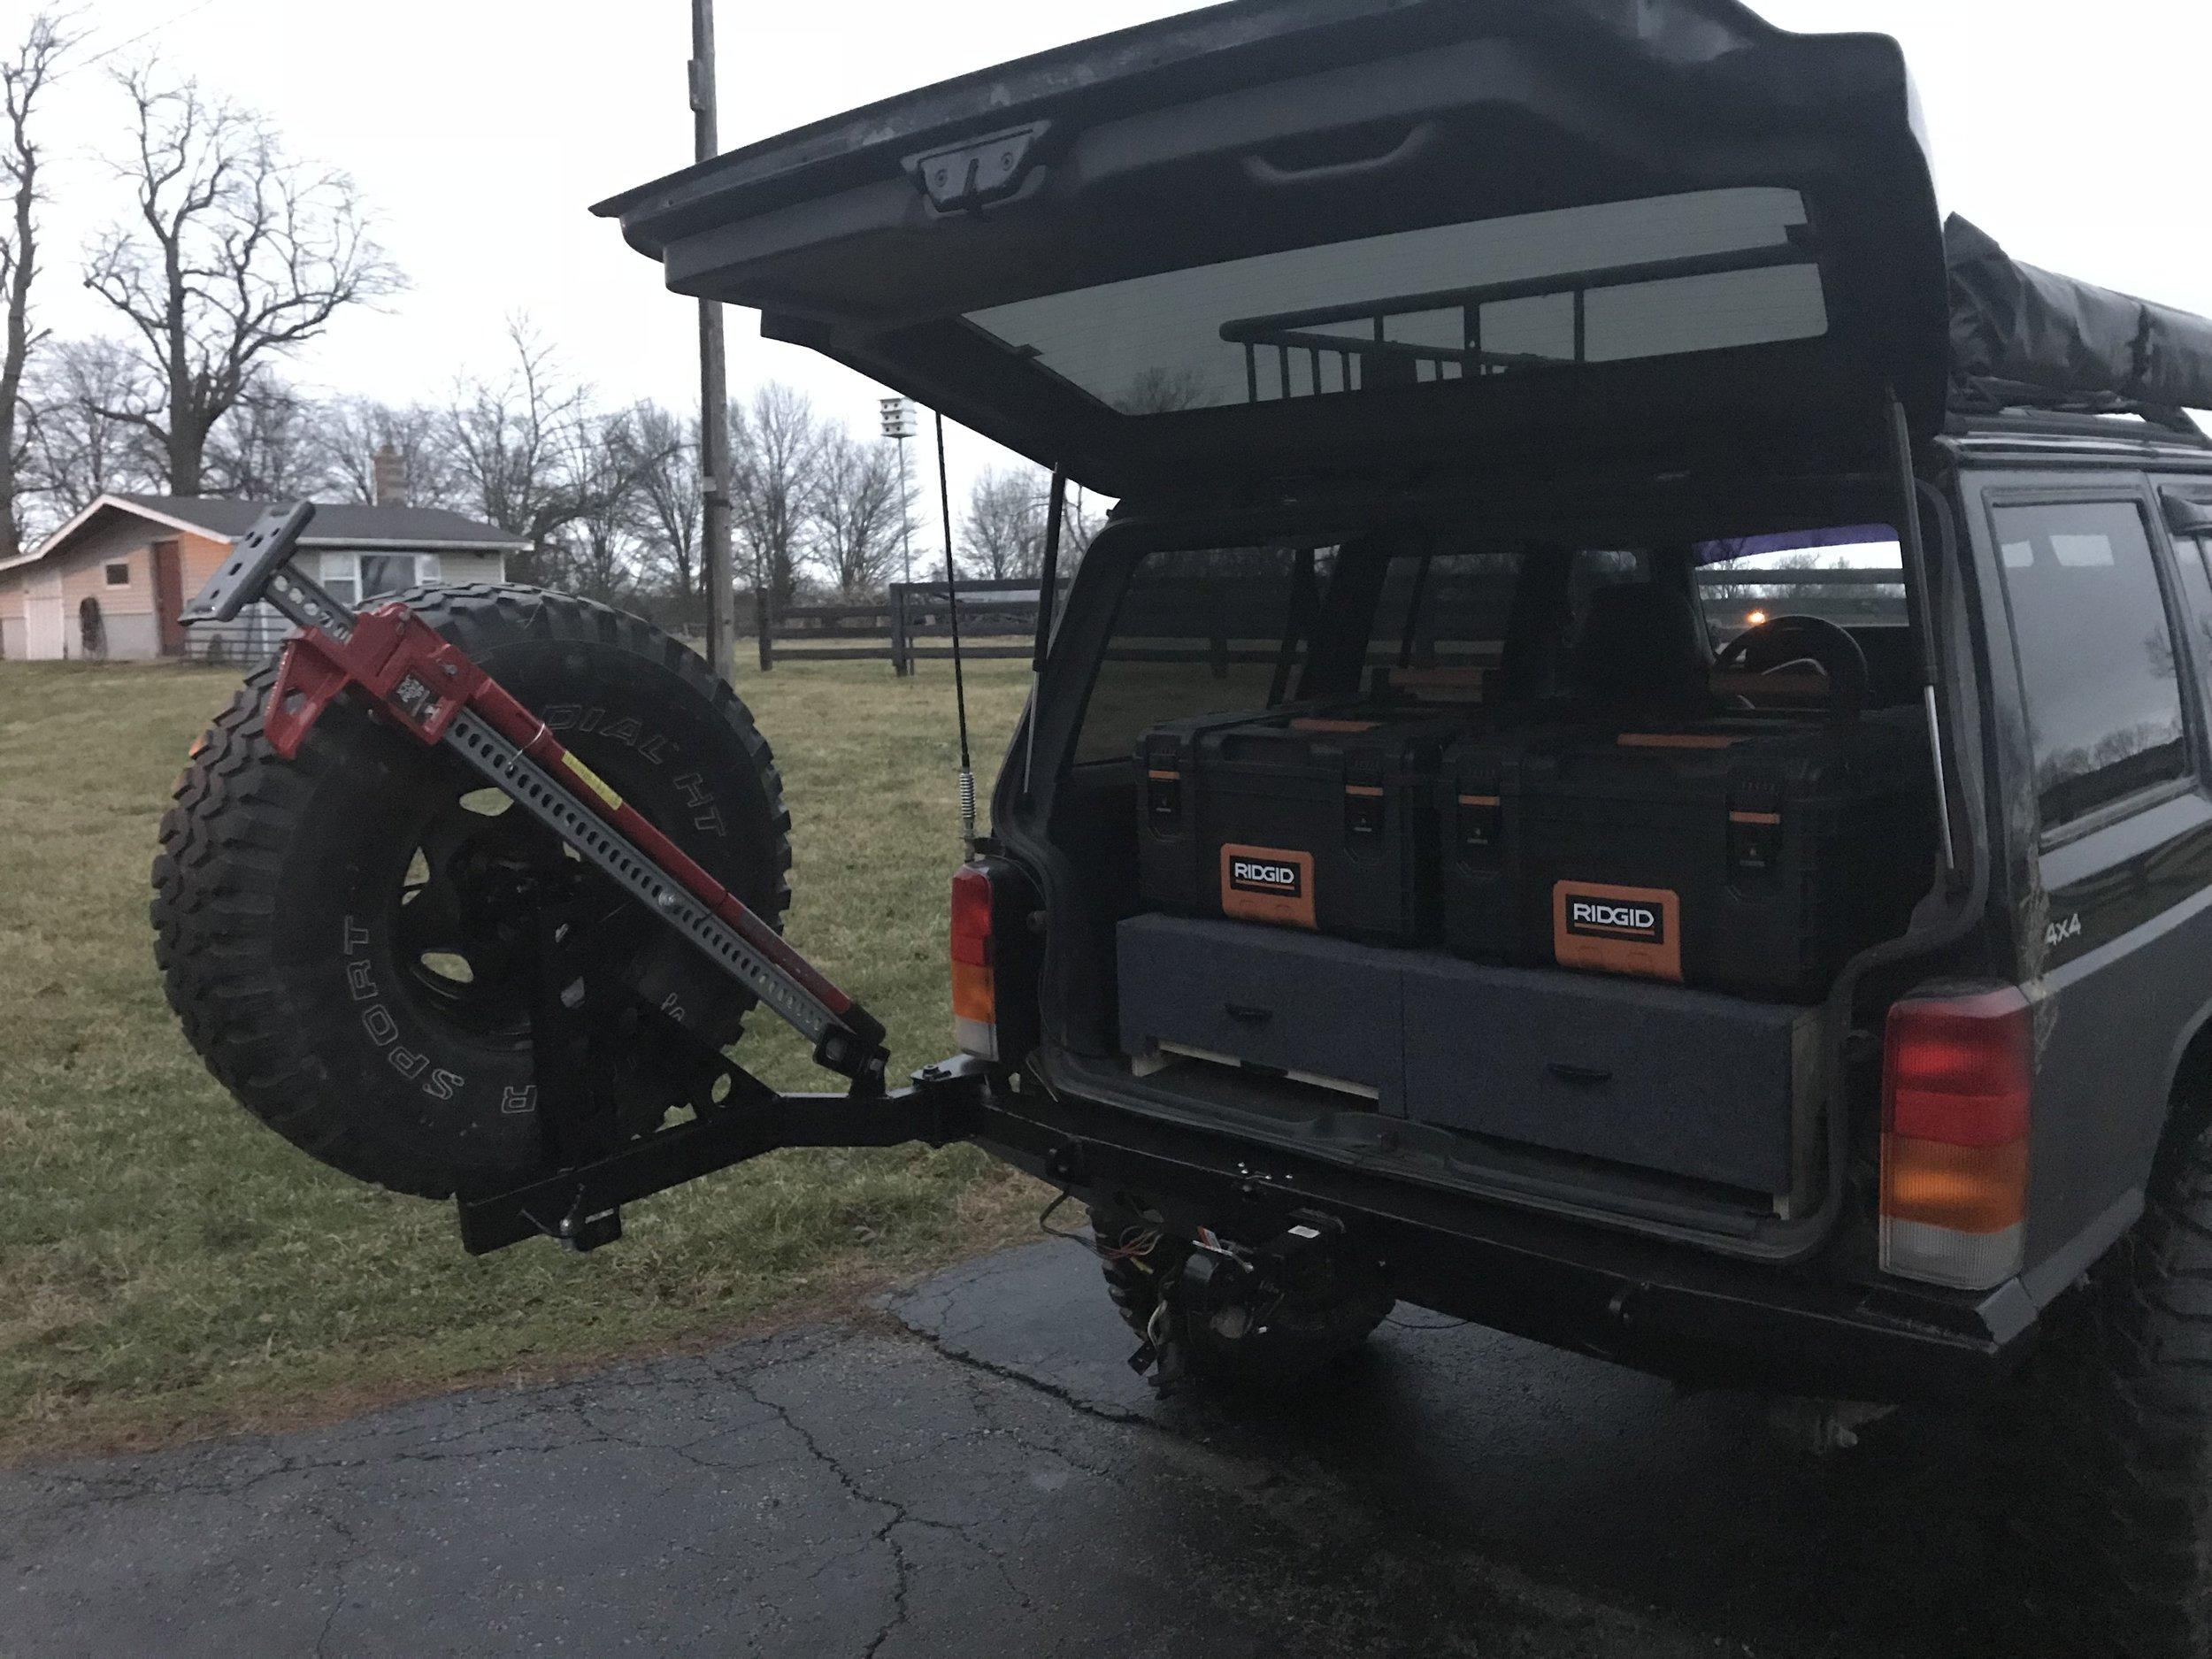 Jeep xj overland.JPG